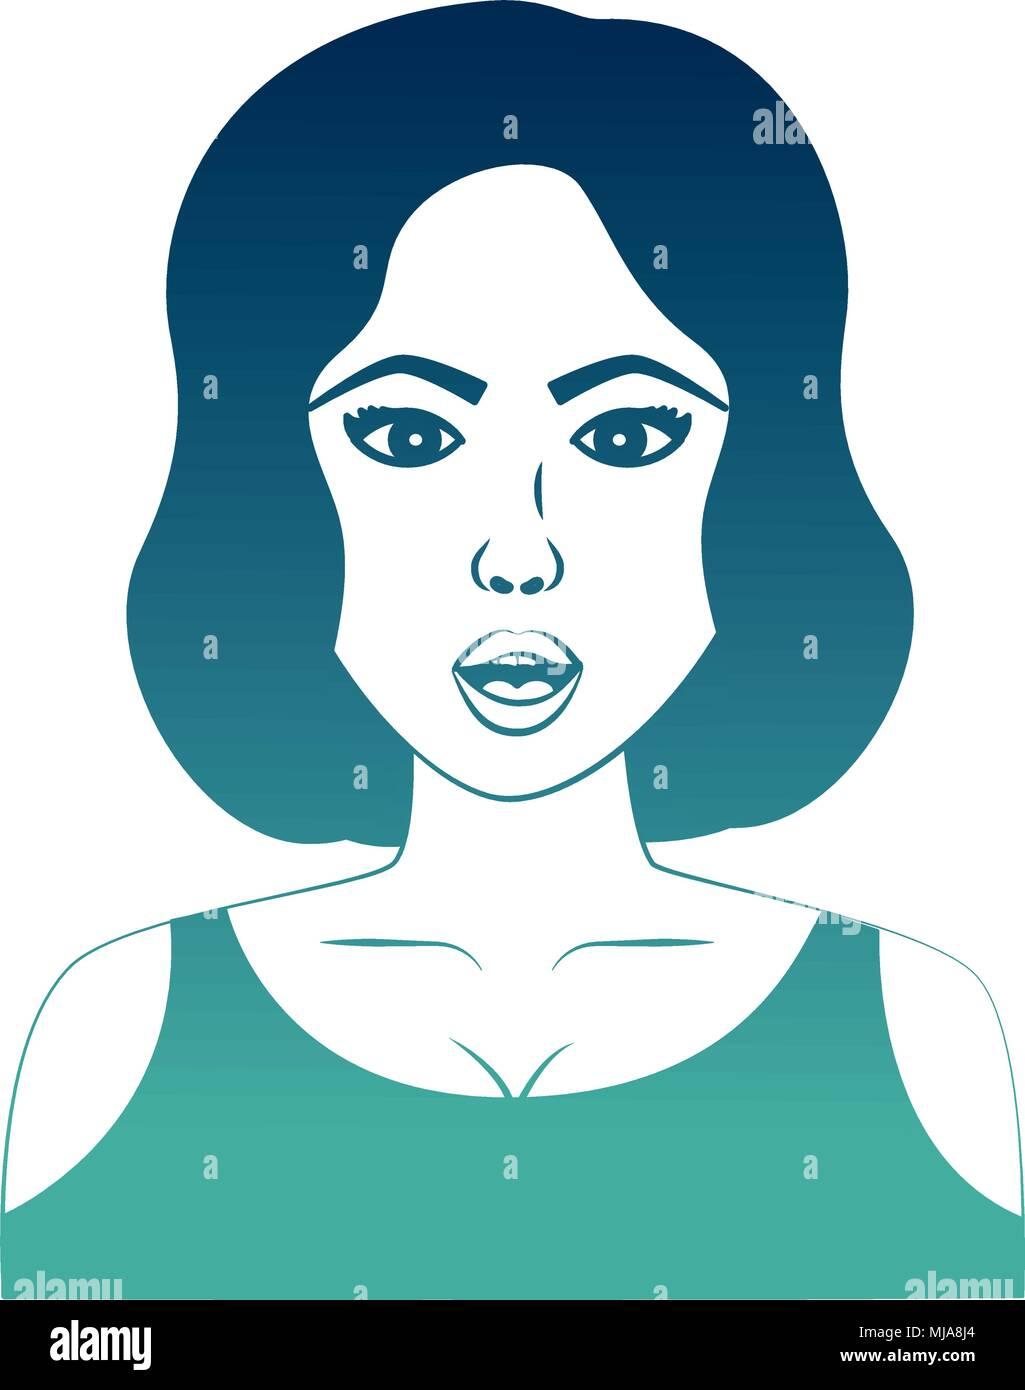 Frau Mit Kurzen Haaren Charakter Pop Art Stil Vector Illustration